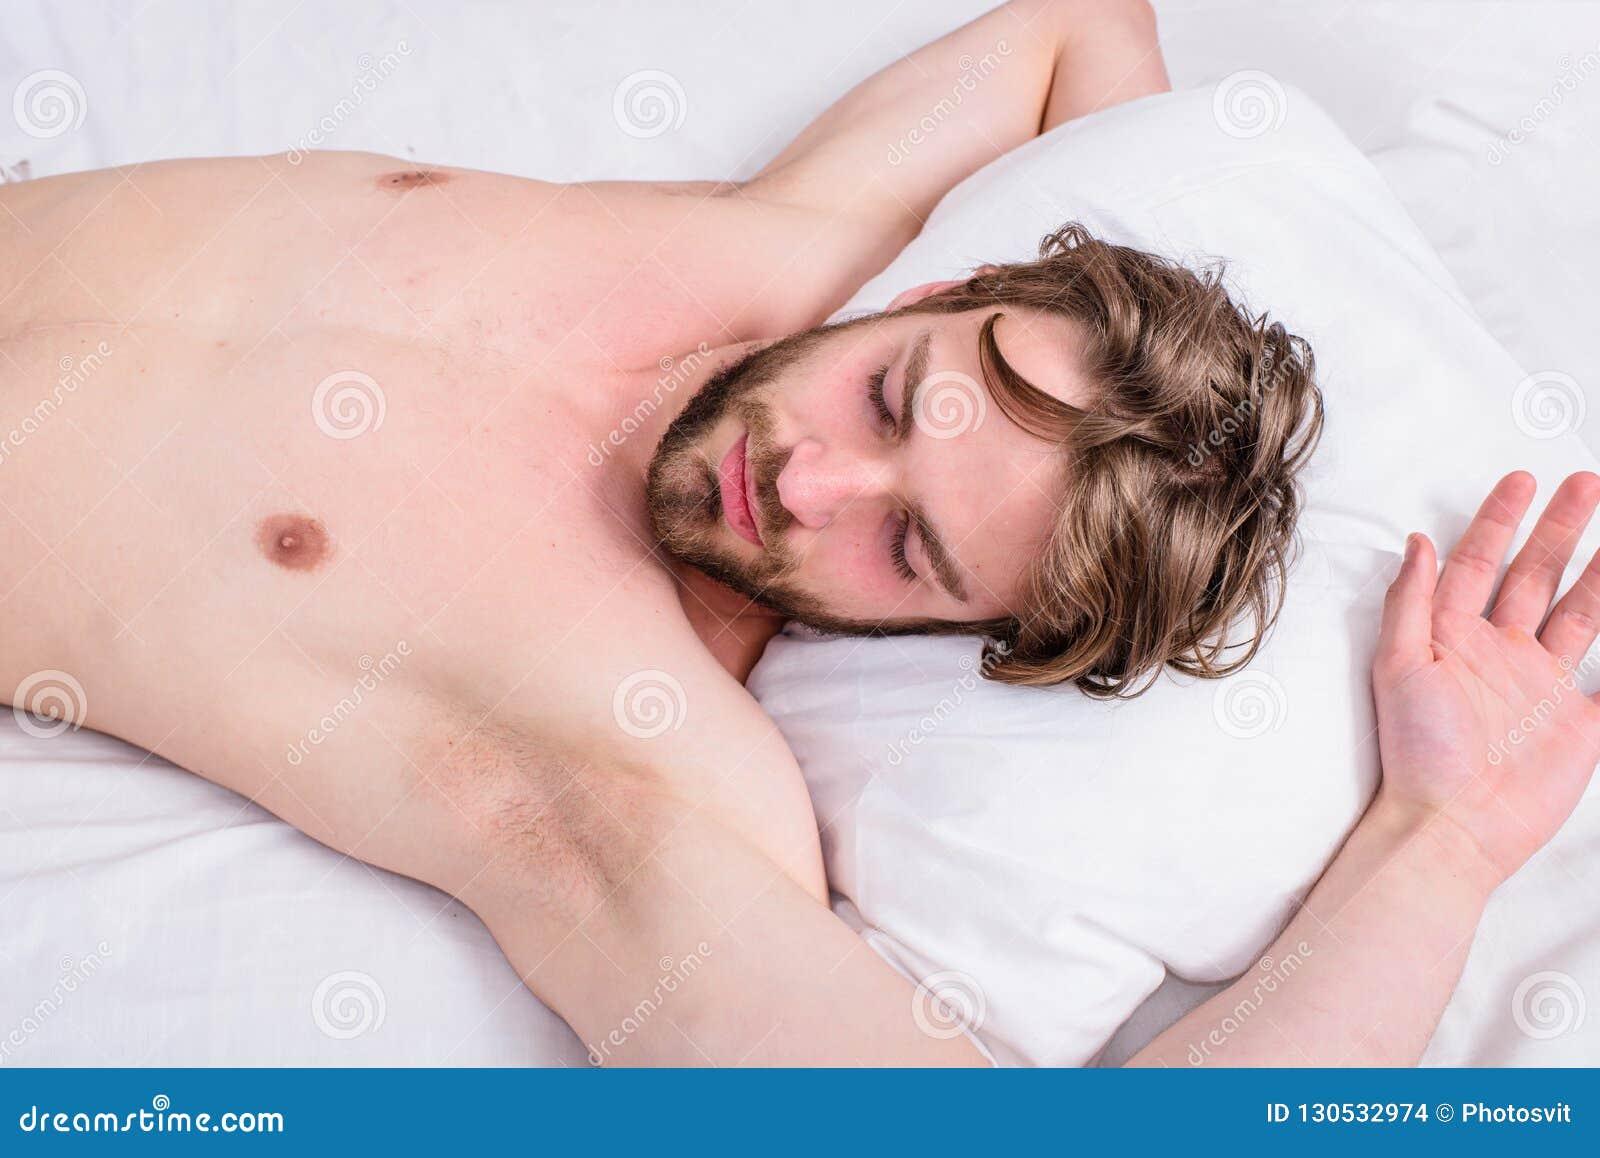 Man sleepy drowsy bearded face having rest. Pleasant awakening concept. Guy sleepy morning nap. Man unshaven handsome